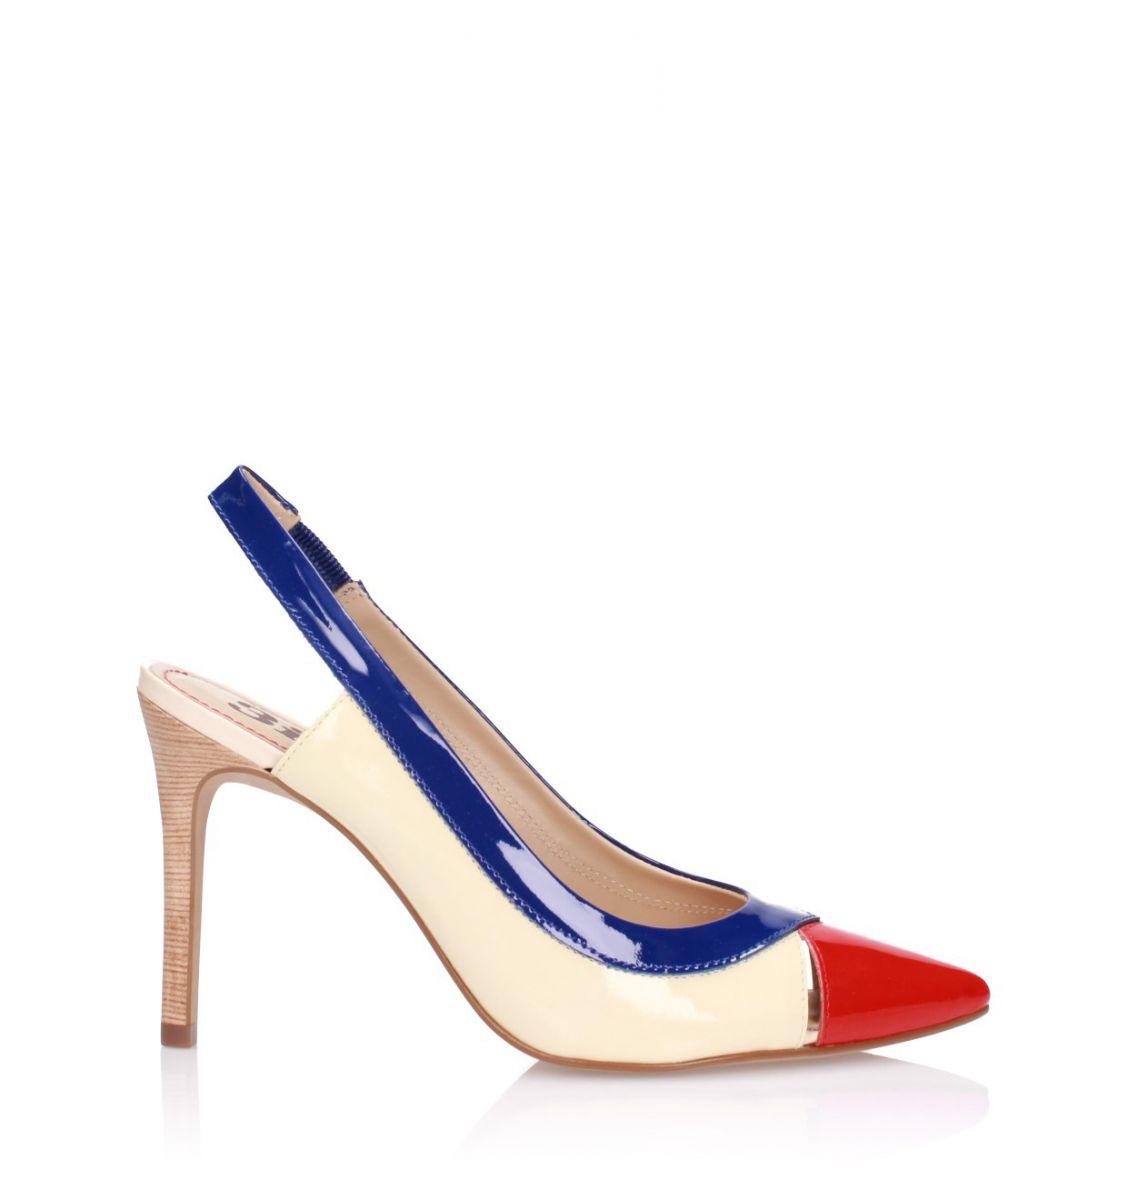 Multicolour high heeled sandals